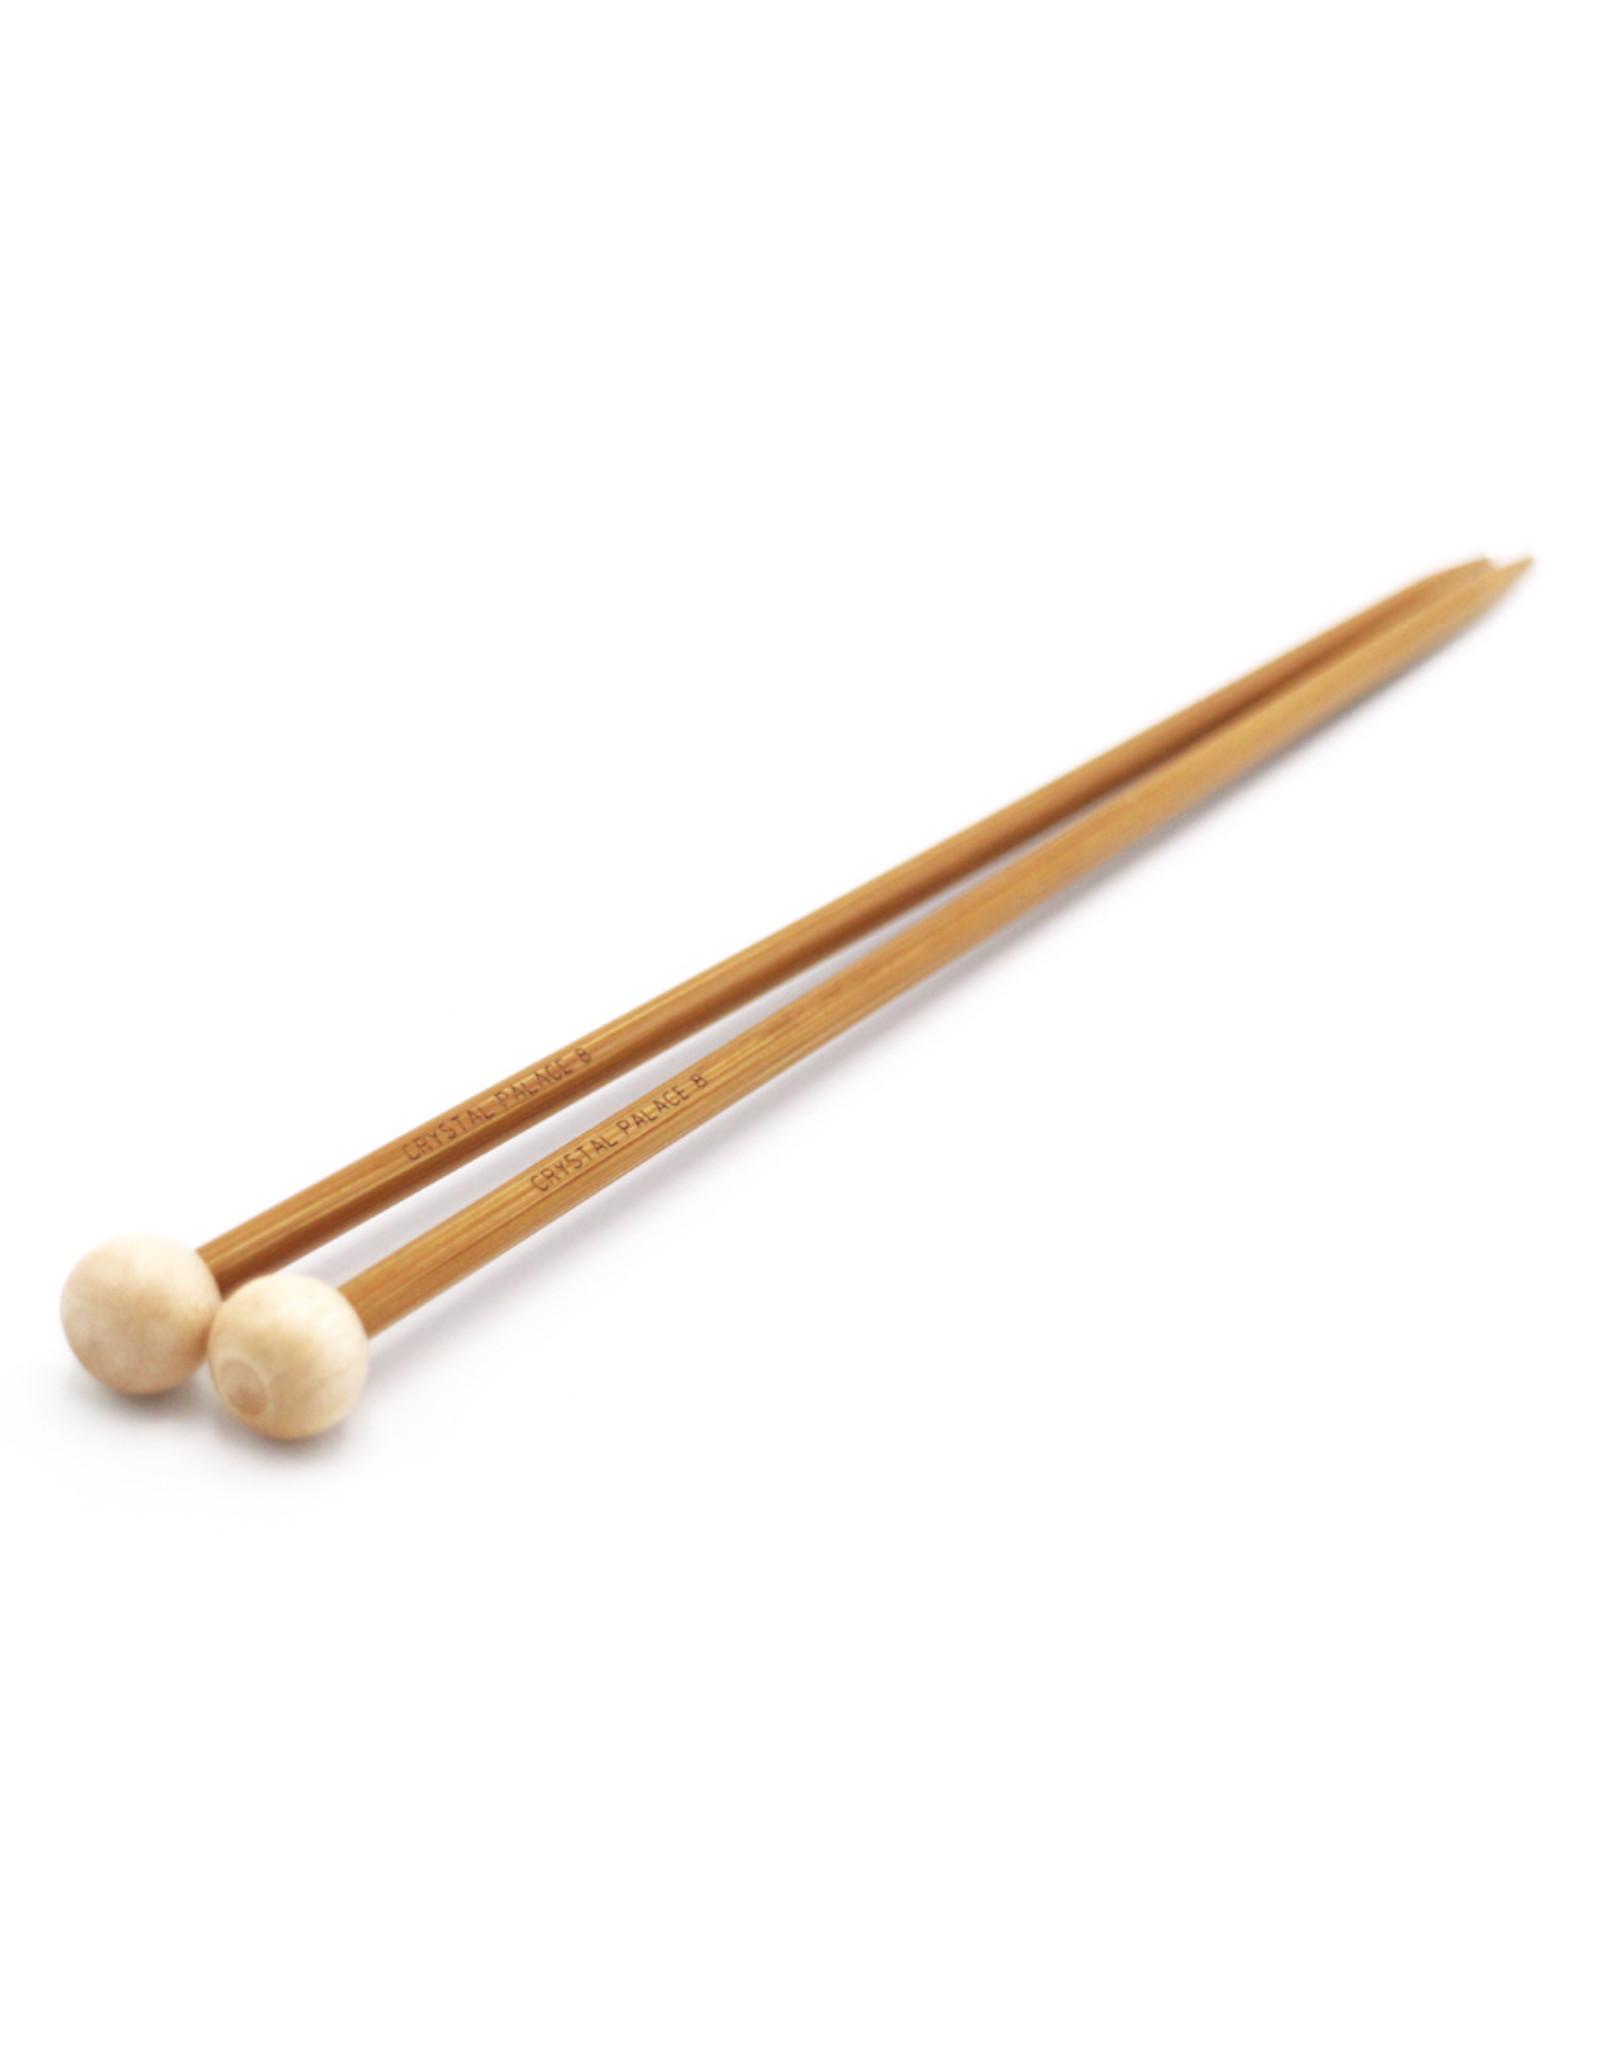 Crystal Palace Bamboo Crystal Palace Bamboo Single Point Needles